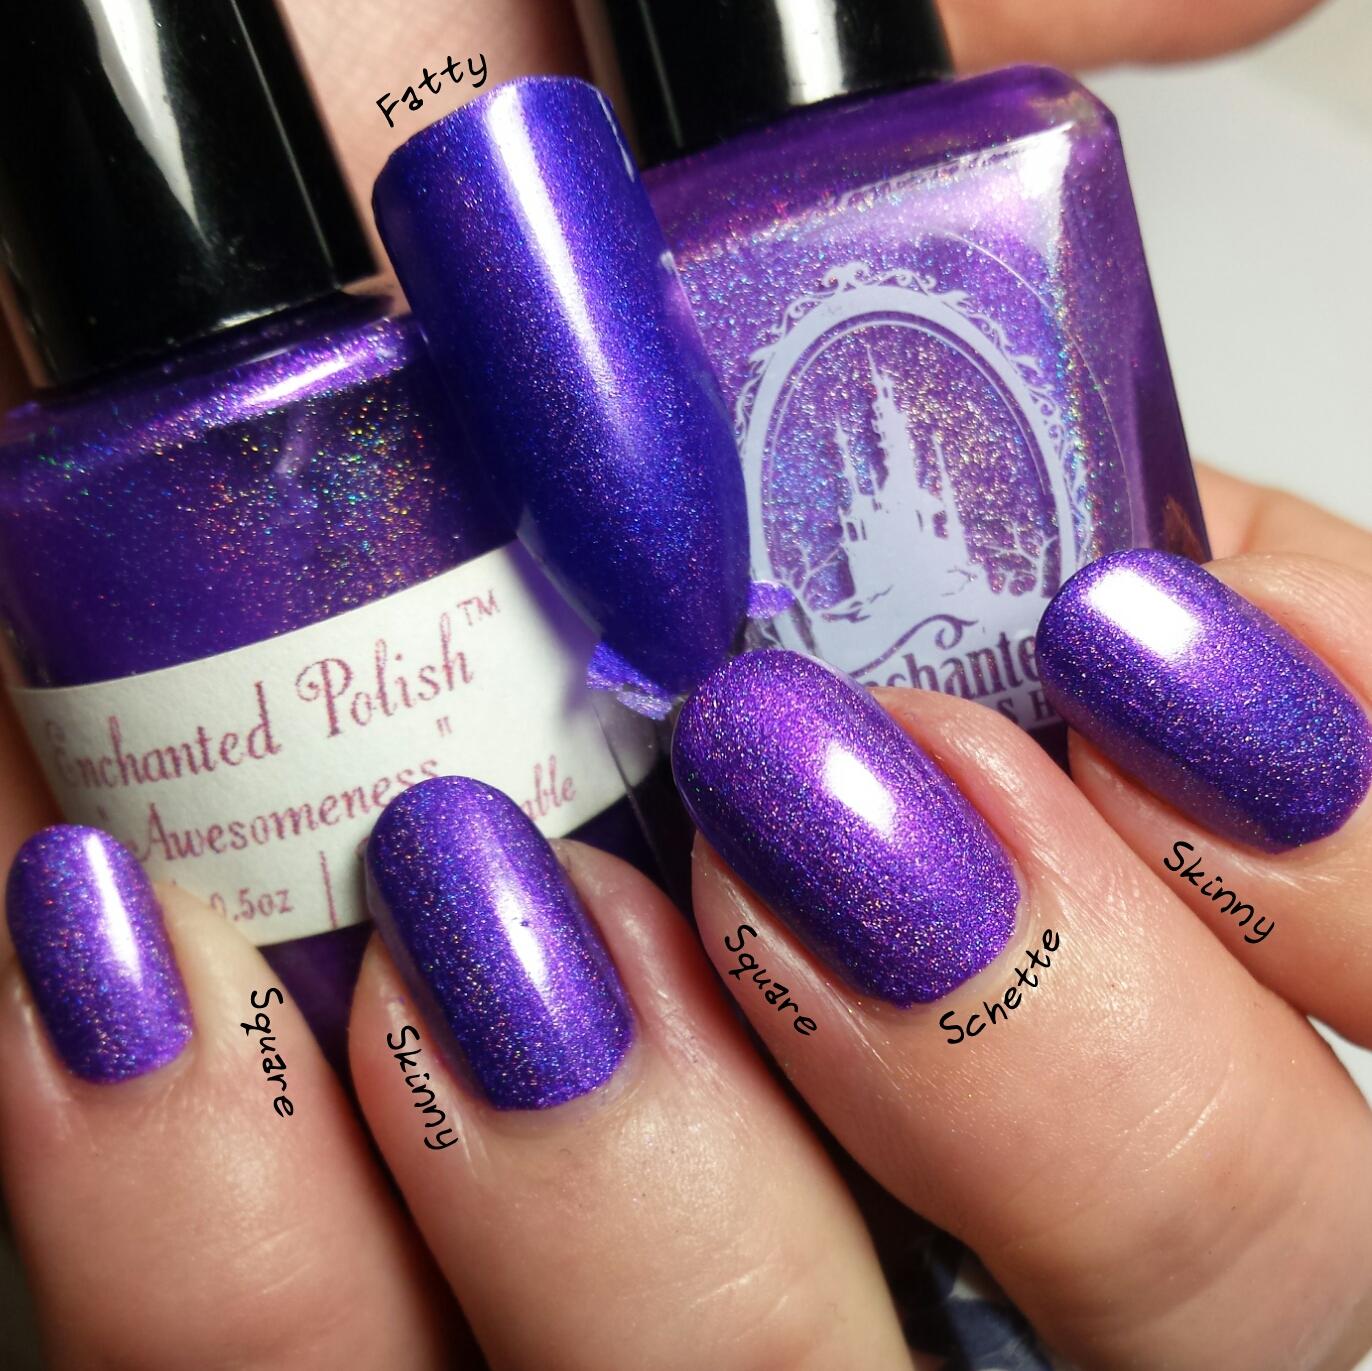 Enchanted Polish Awesomeness - Comparison Fatty / Skiny / Square